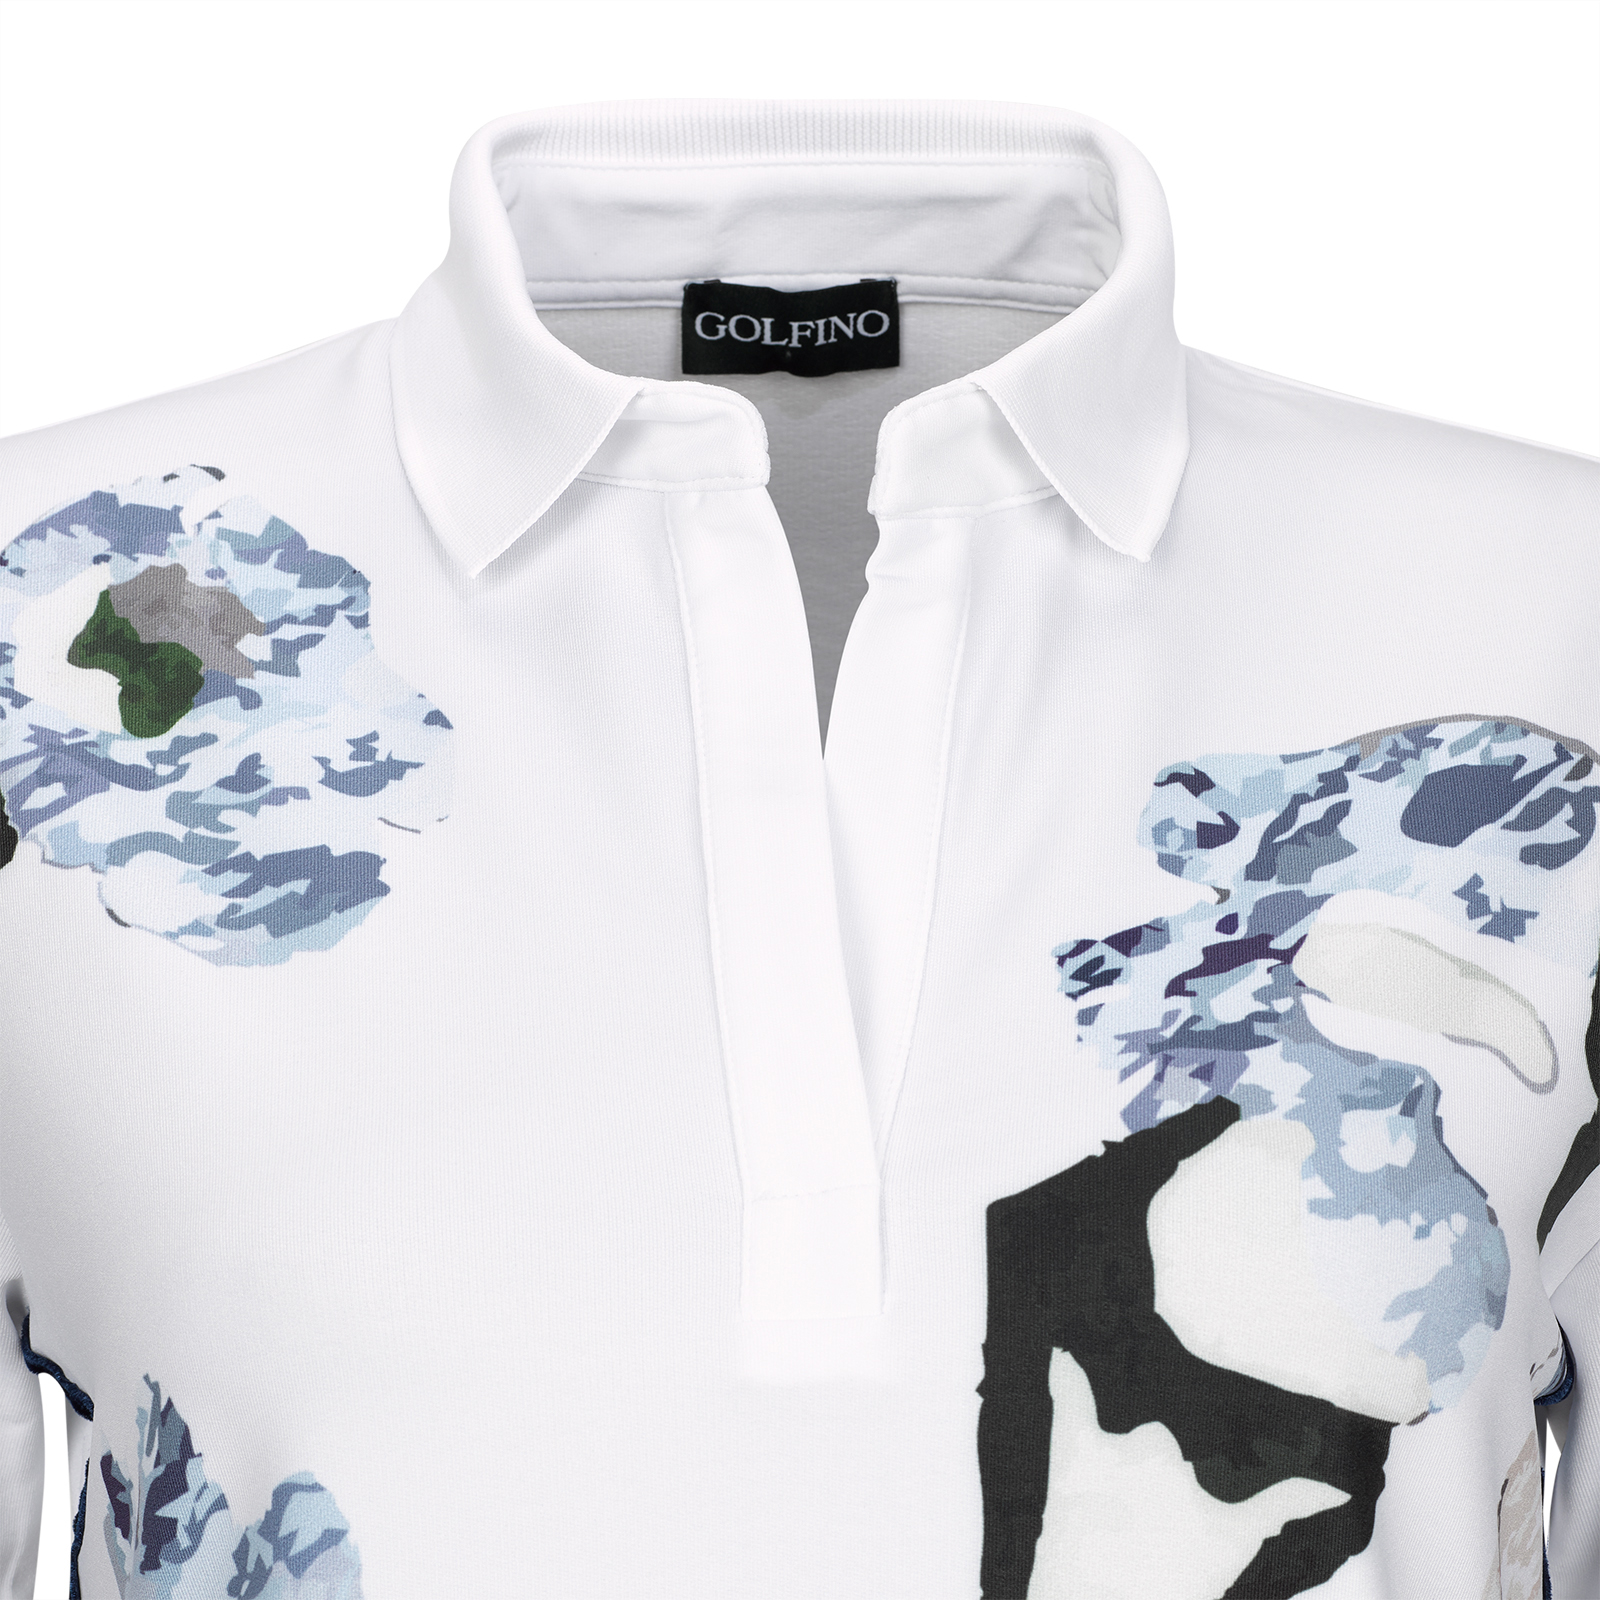 Damen Halbarm Techno-Stretch Funktions-Golfpolohemd mit floralem Print